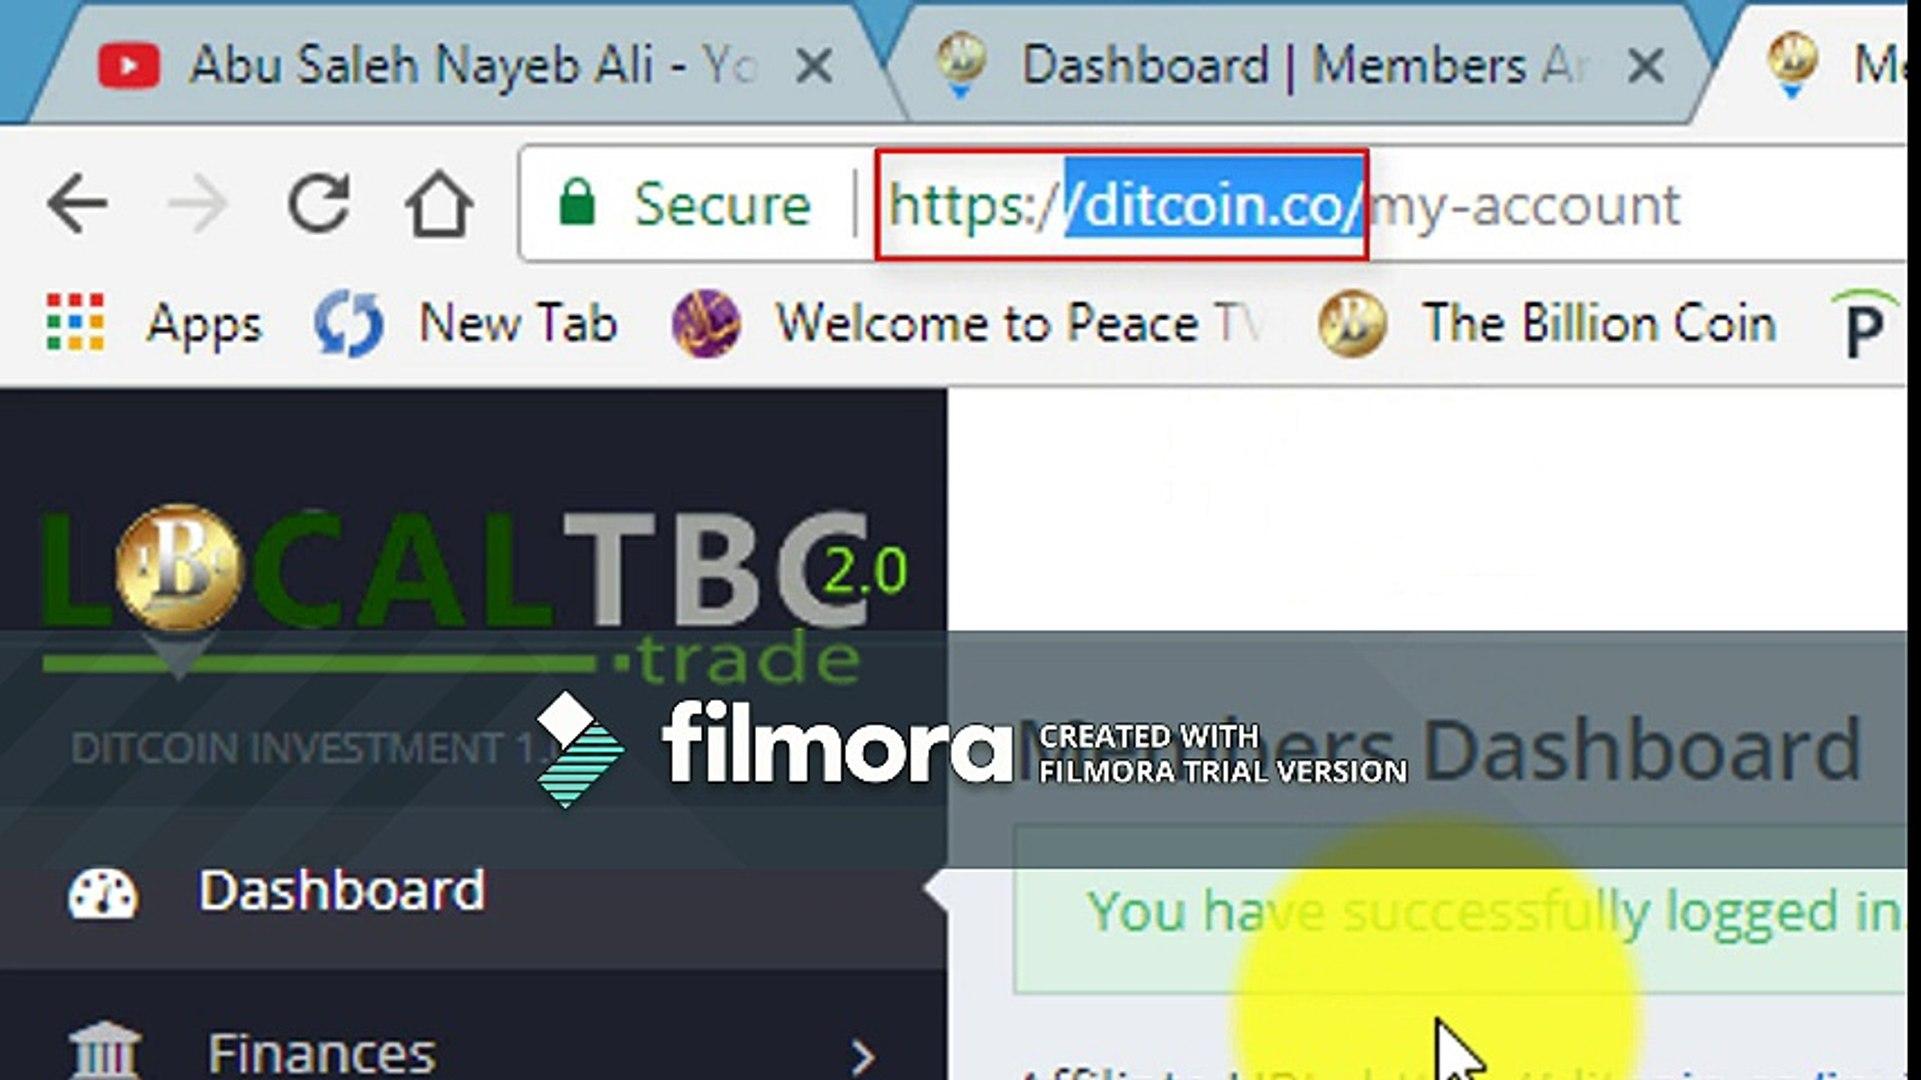 new world crypto currency DITCOIN (DTC) like  bitcoin